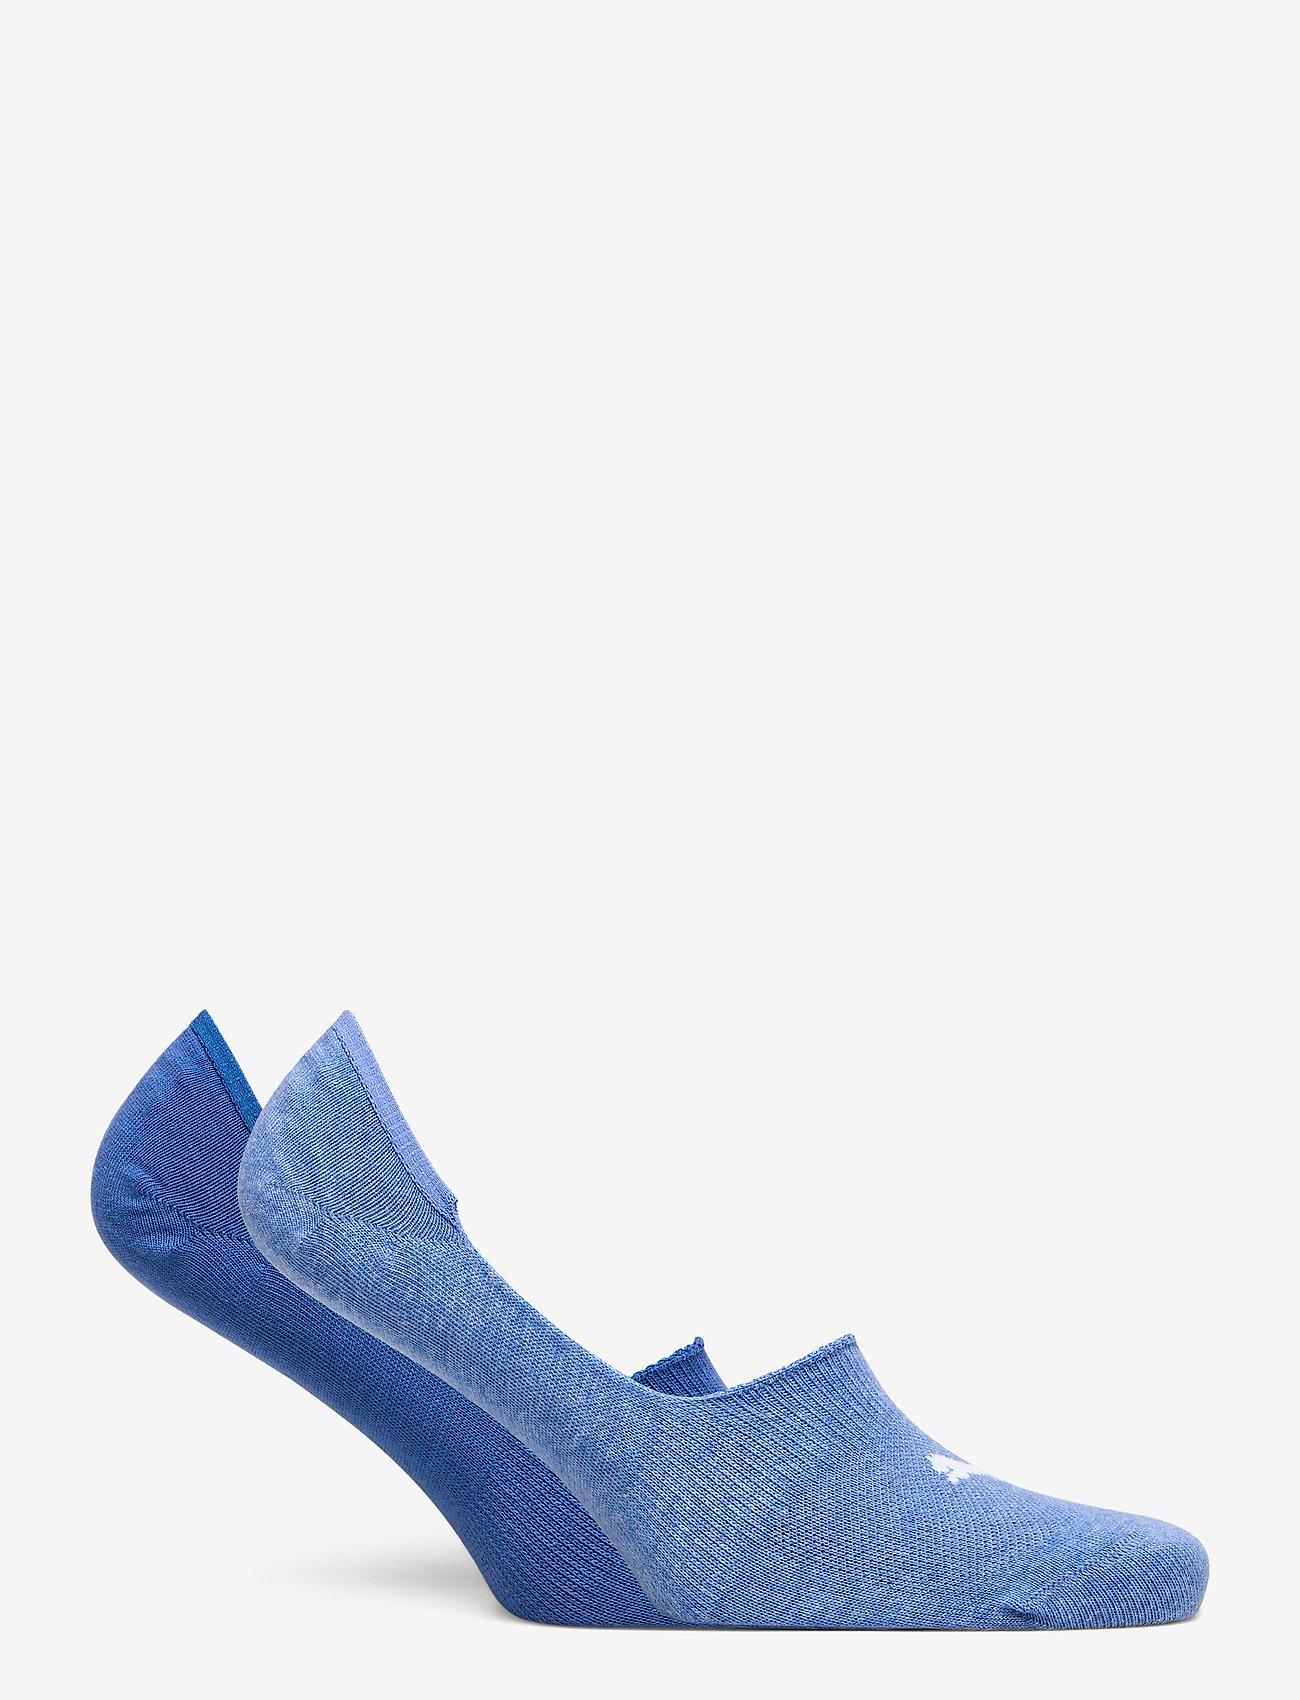 PUMA - PUMA FOOTIE 2P UNISEX - kousen - blue combo - 1